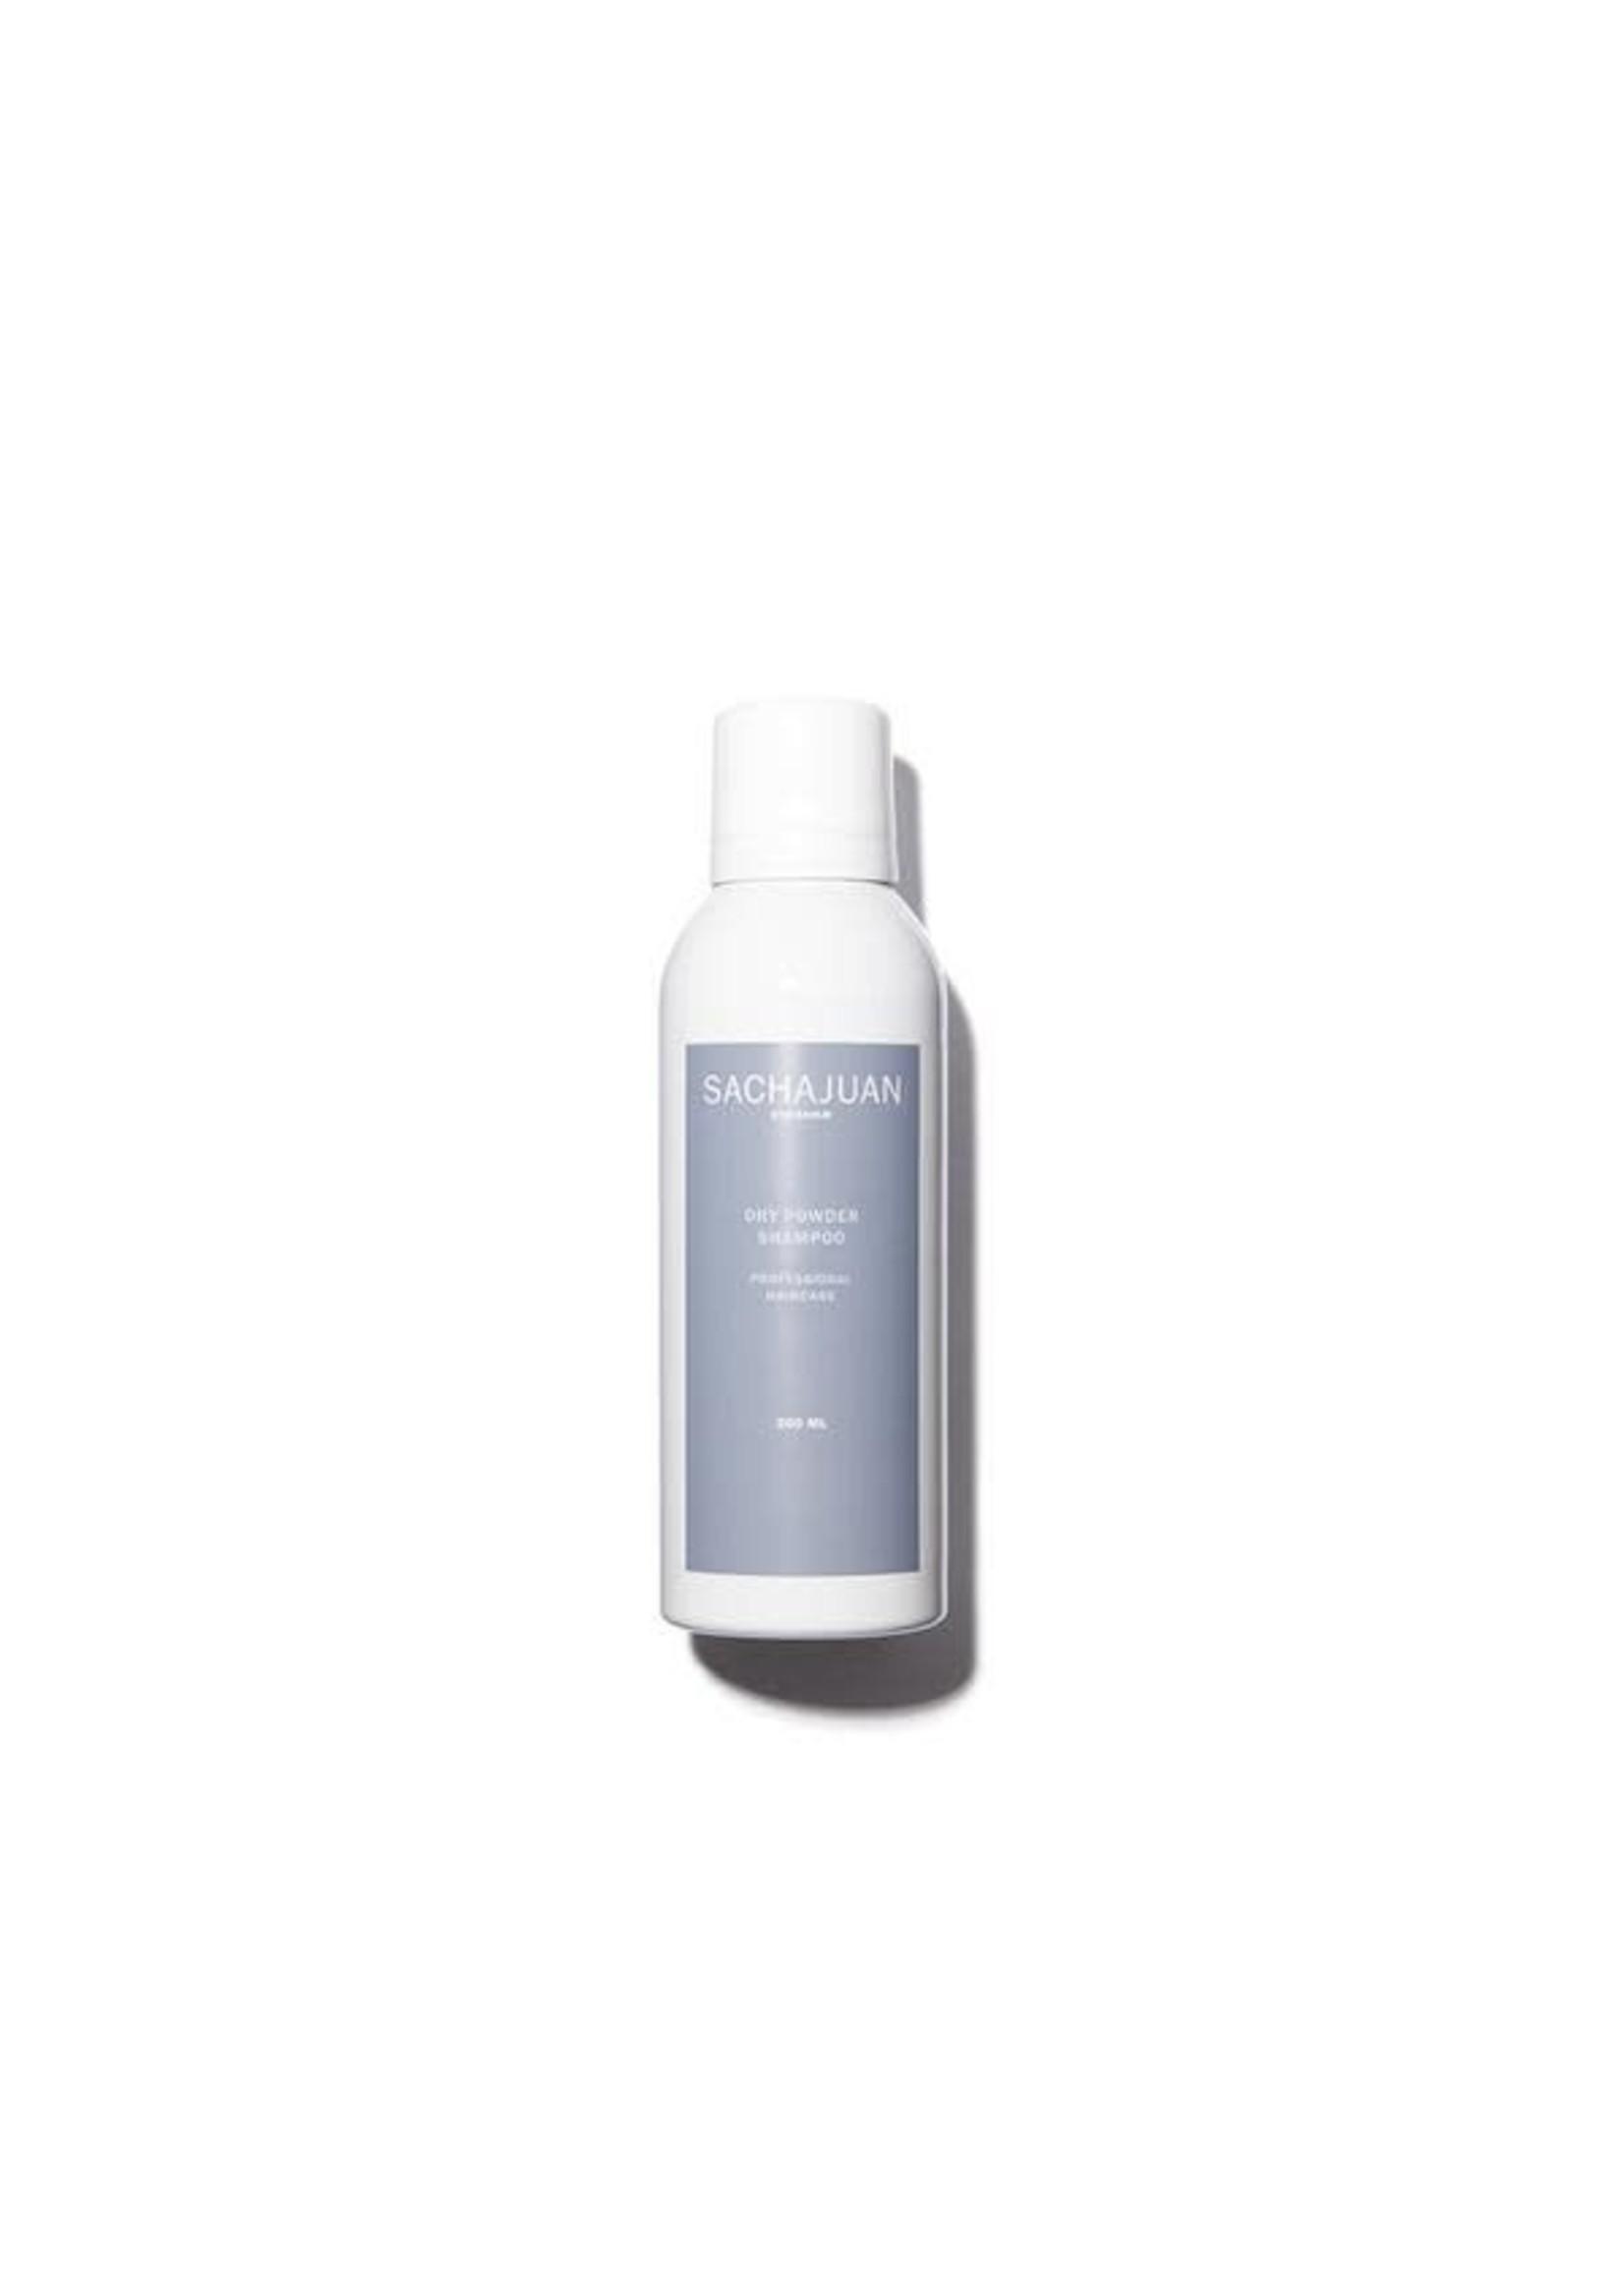 Sachajuan Dry Powder Shampoo 200ml